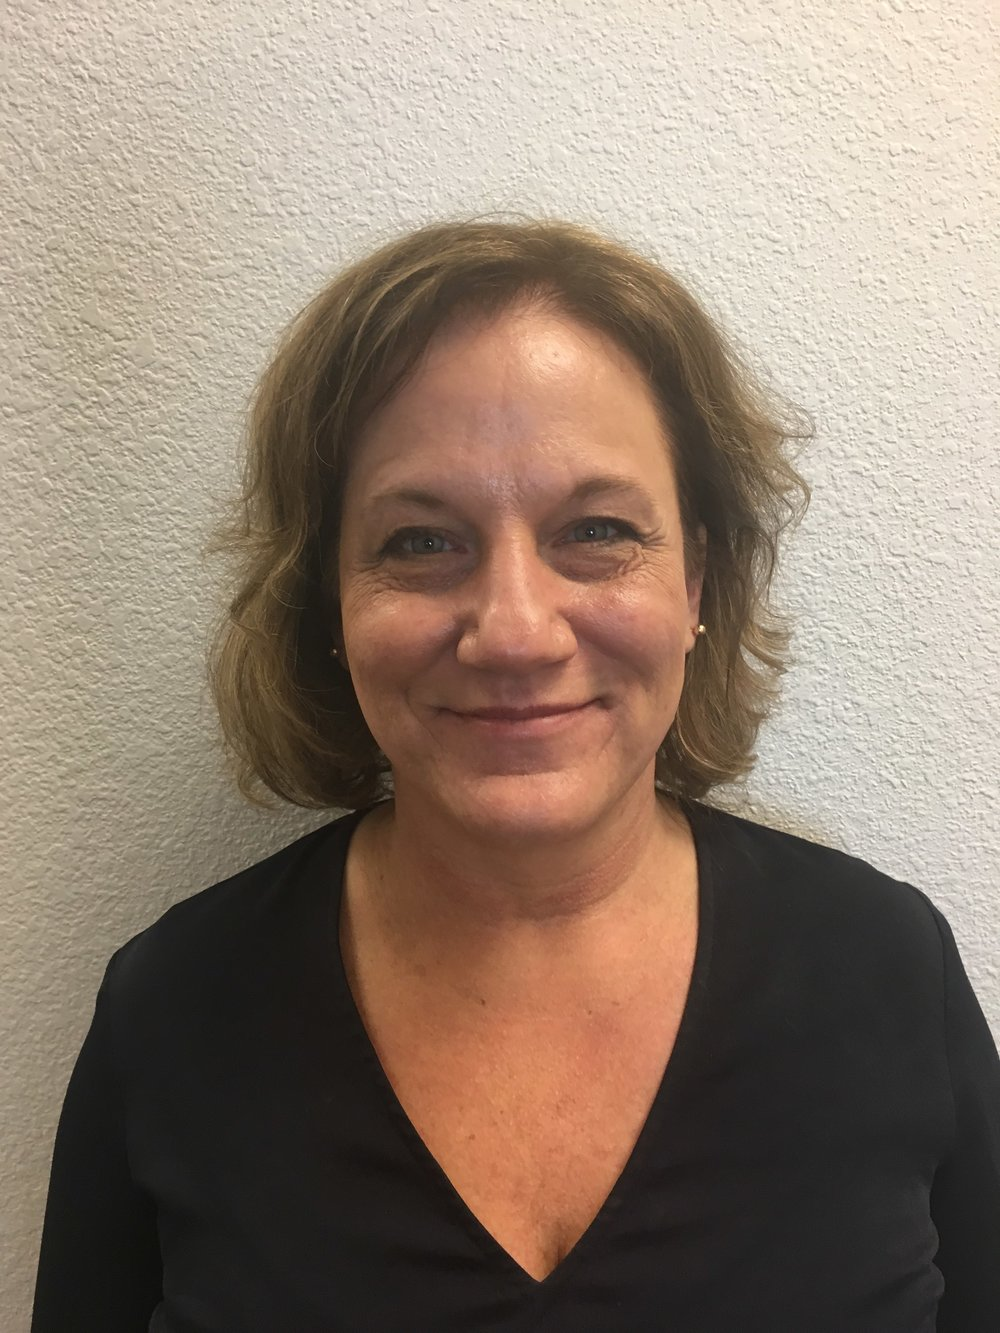 Lora Hanson, Director of Operations